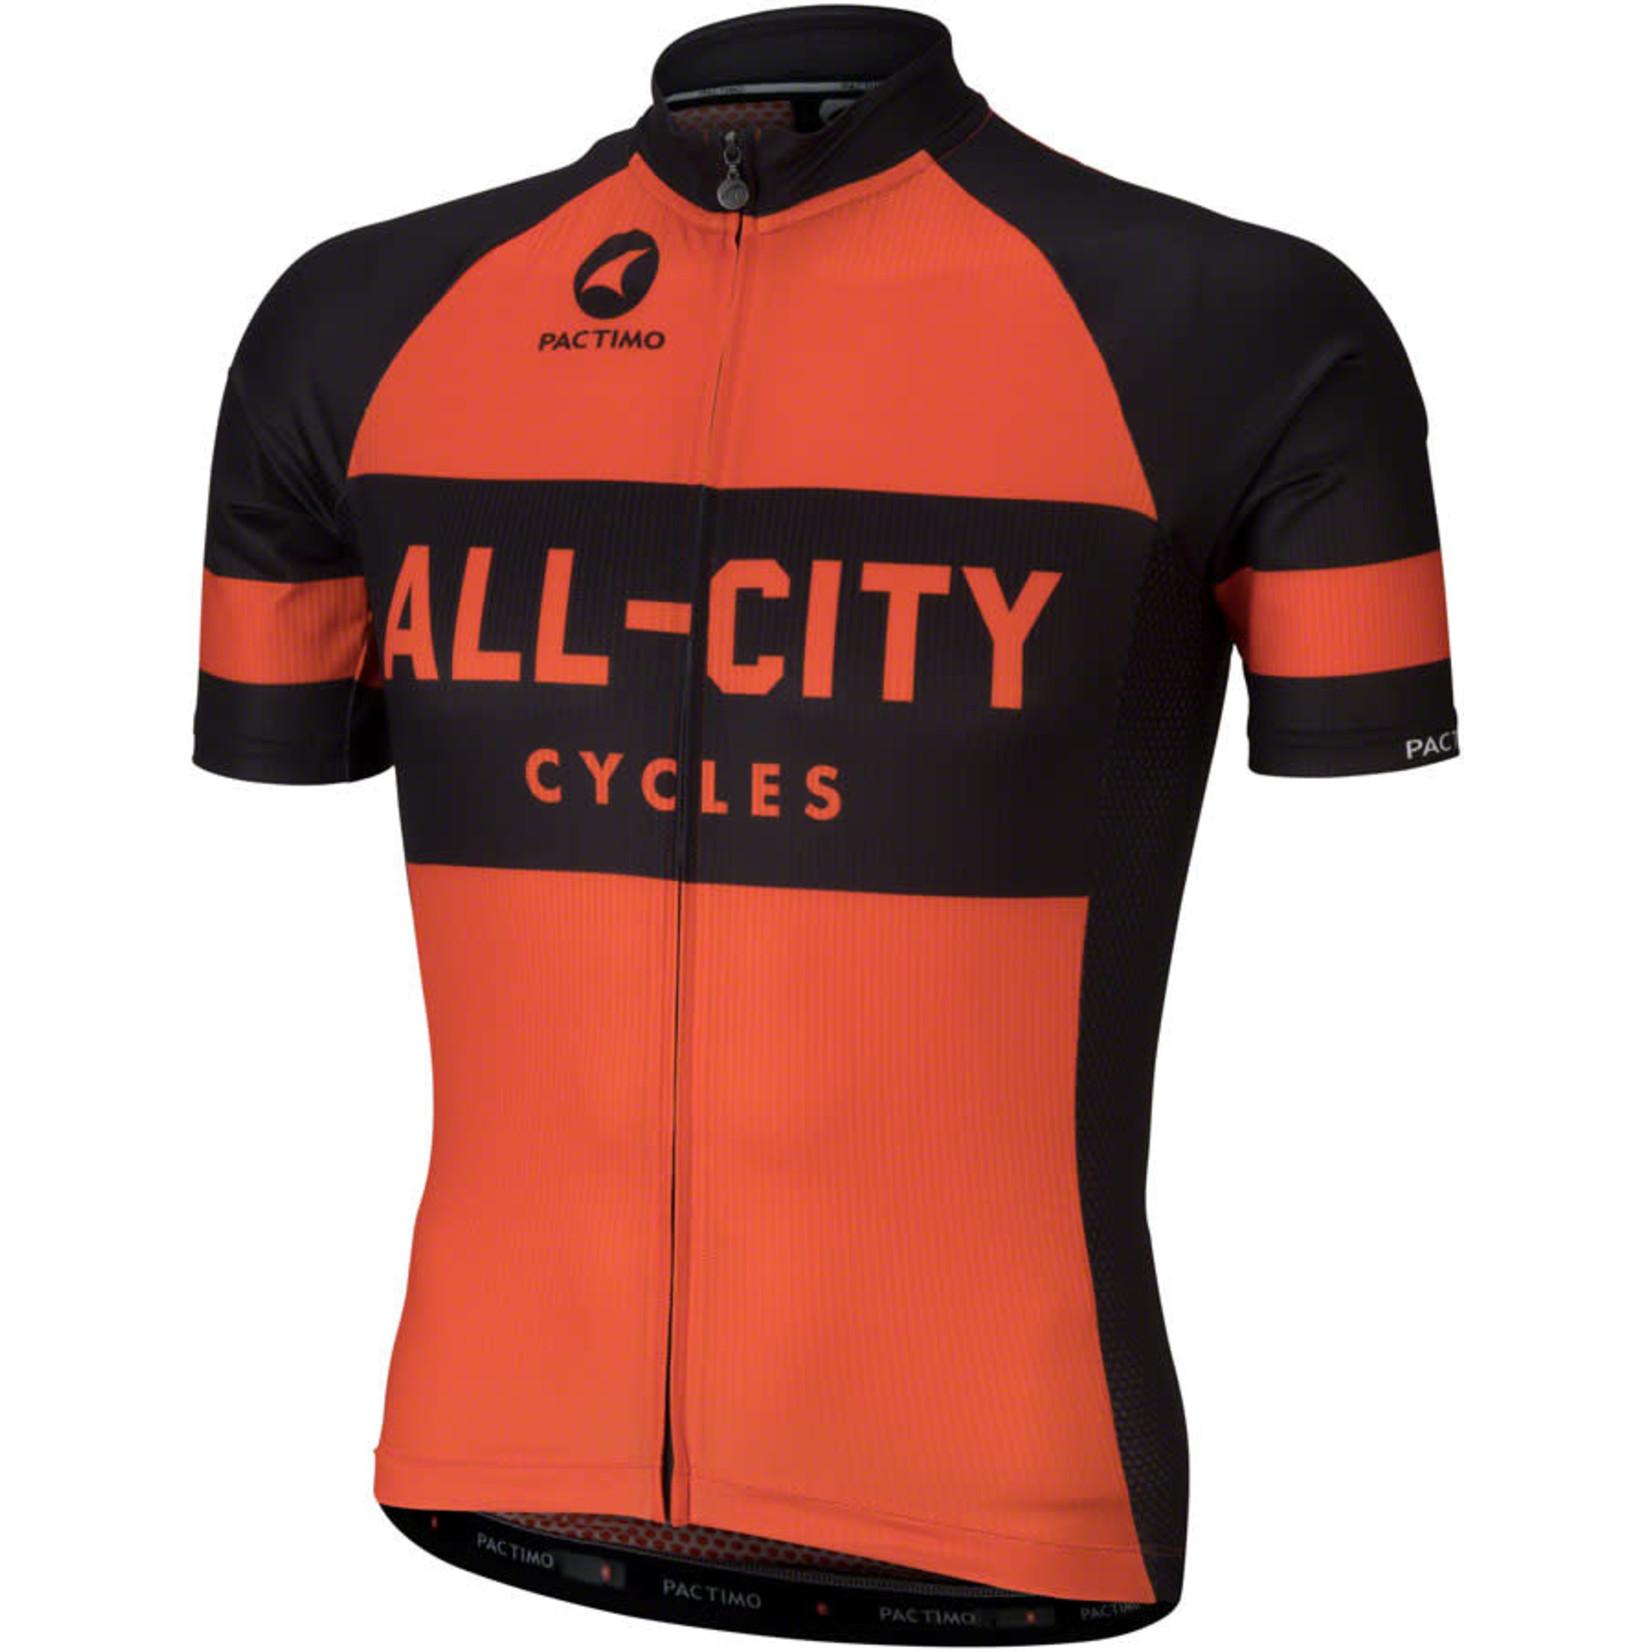 All-City All-City Classic Jersey - Orange, Short Sleeve, Men's, X-Small